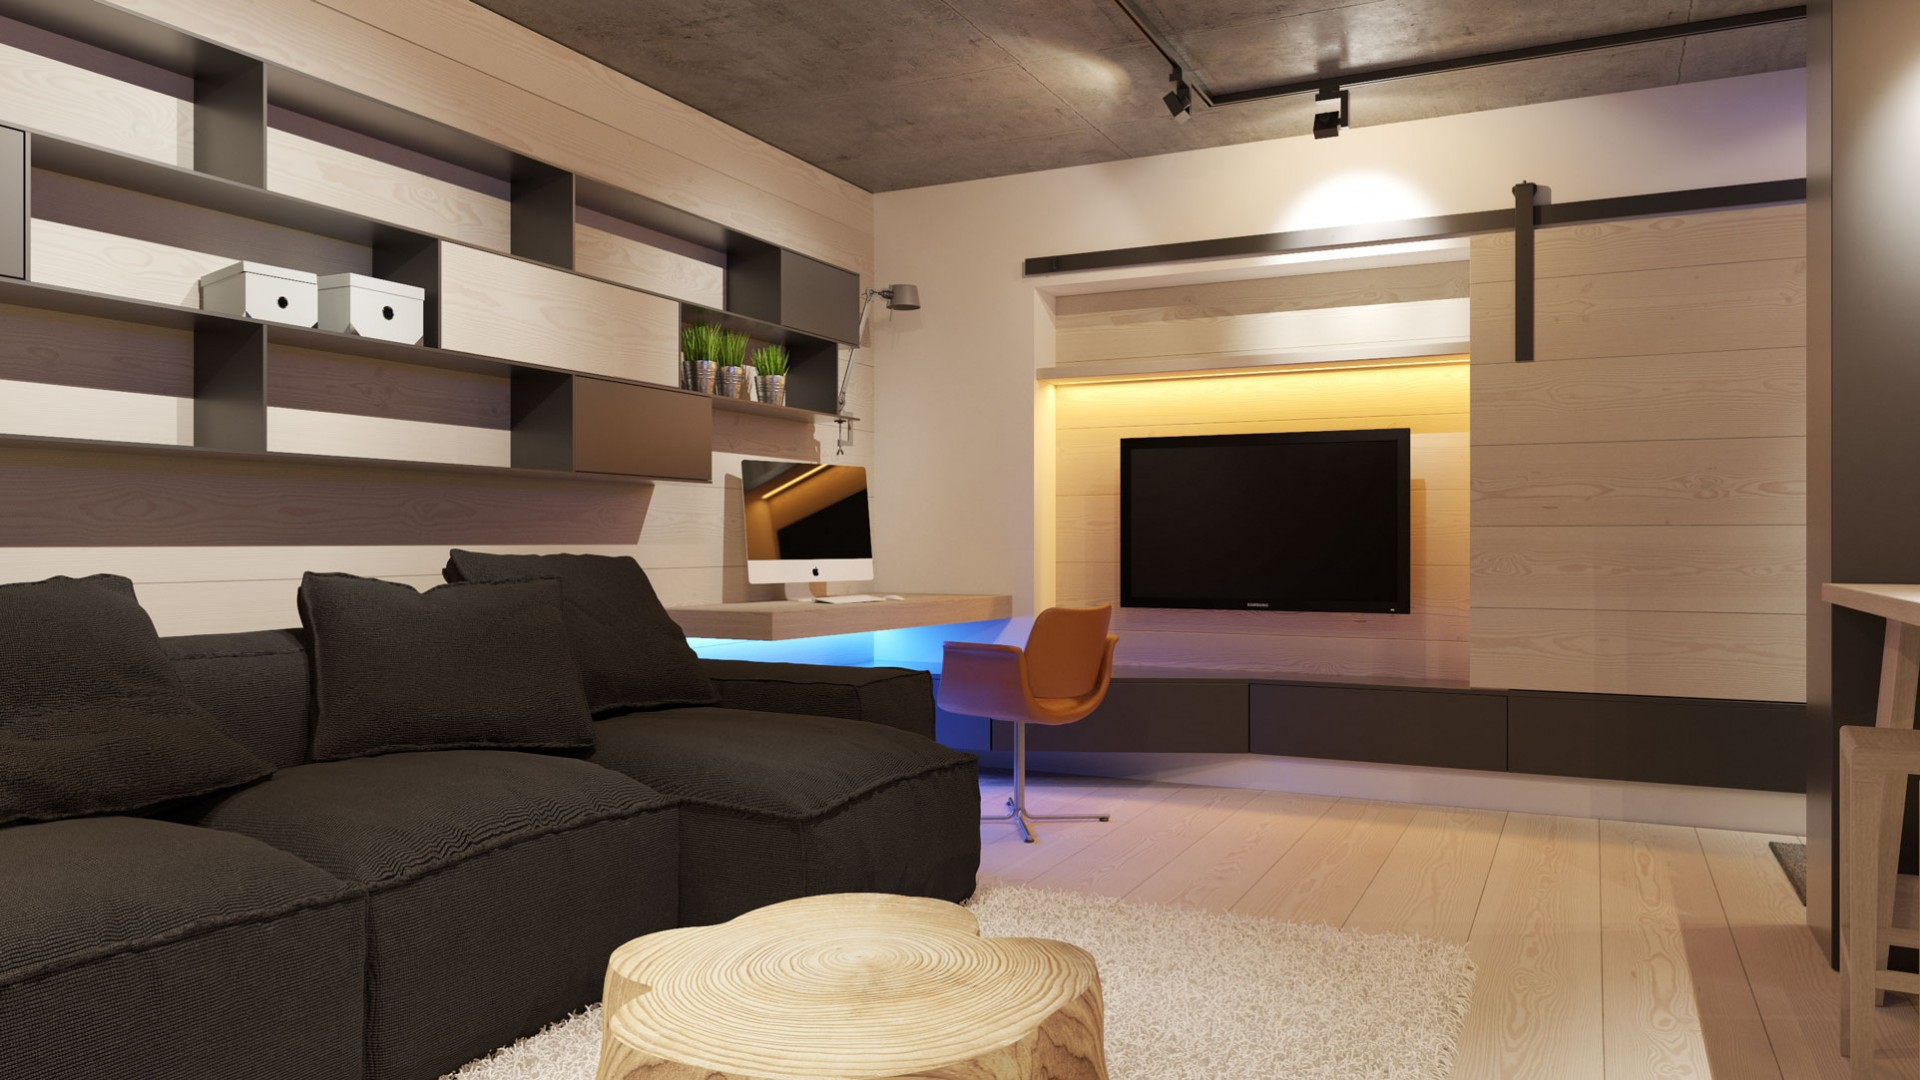 Návrh interiéru bytu Banská Bystrica